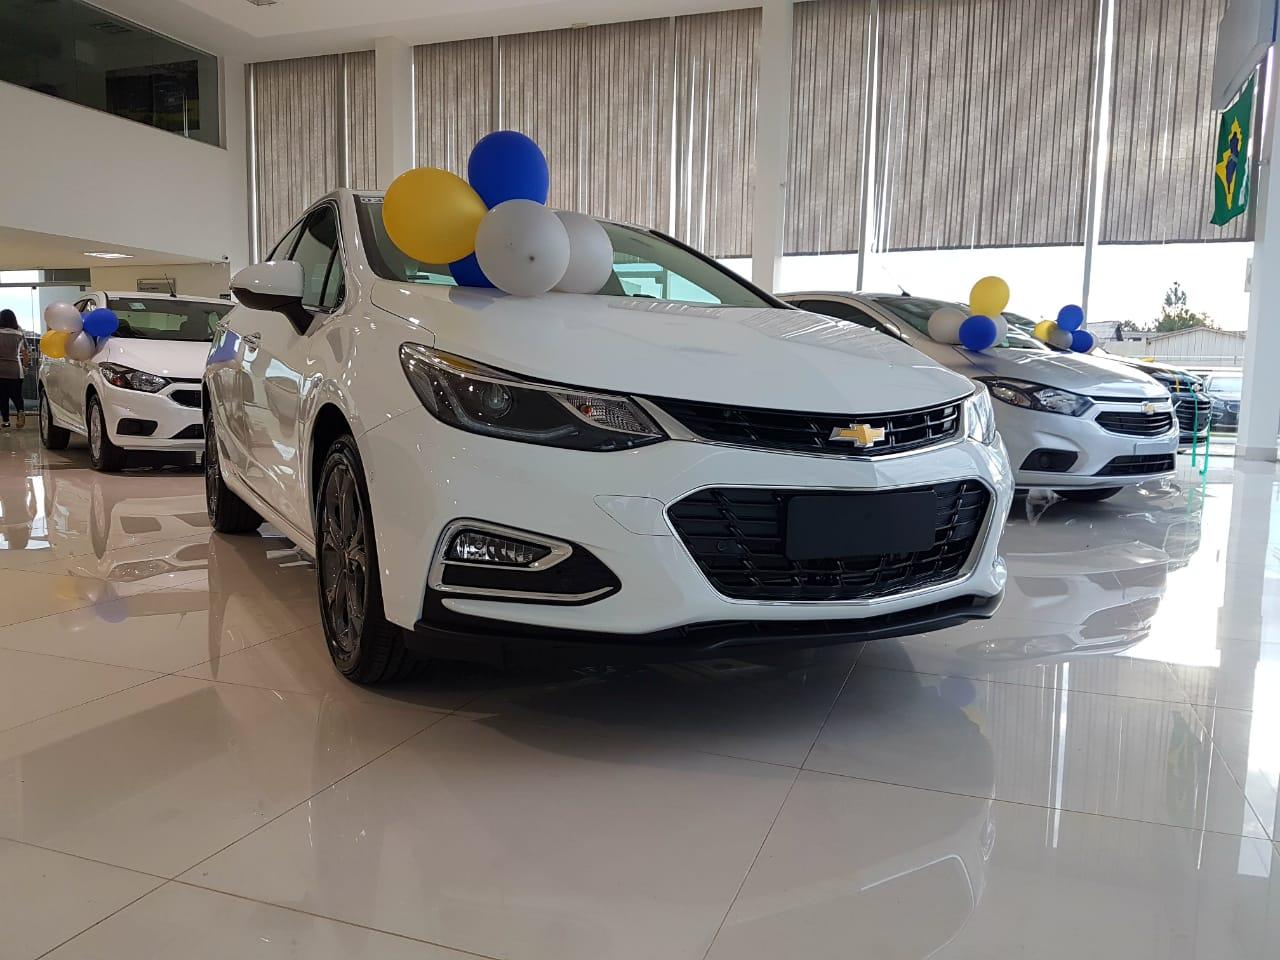 Chevrolet CRUZE SPORT6 LTZ TURBO 1.4 2018